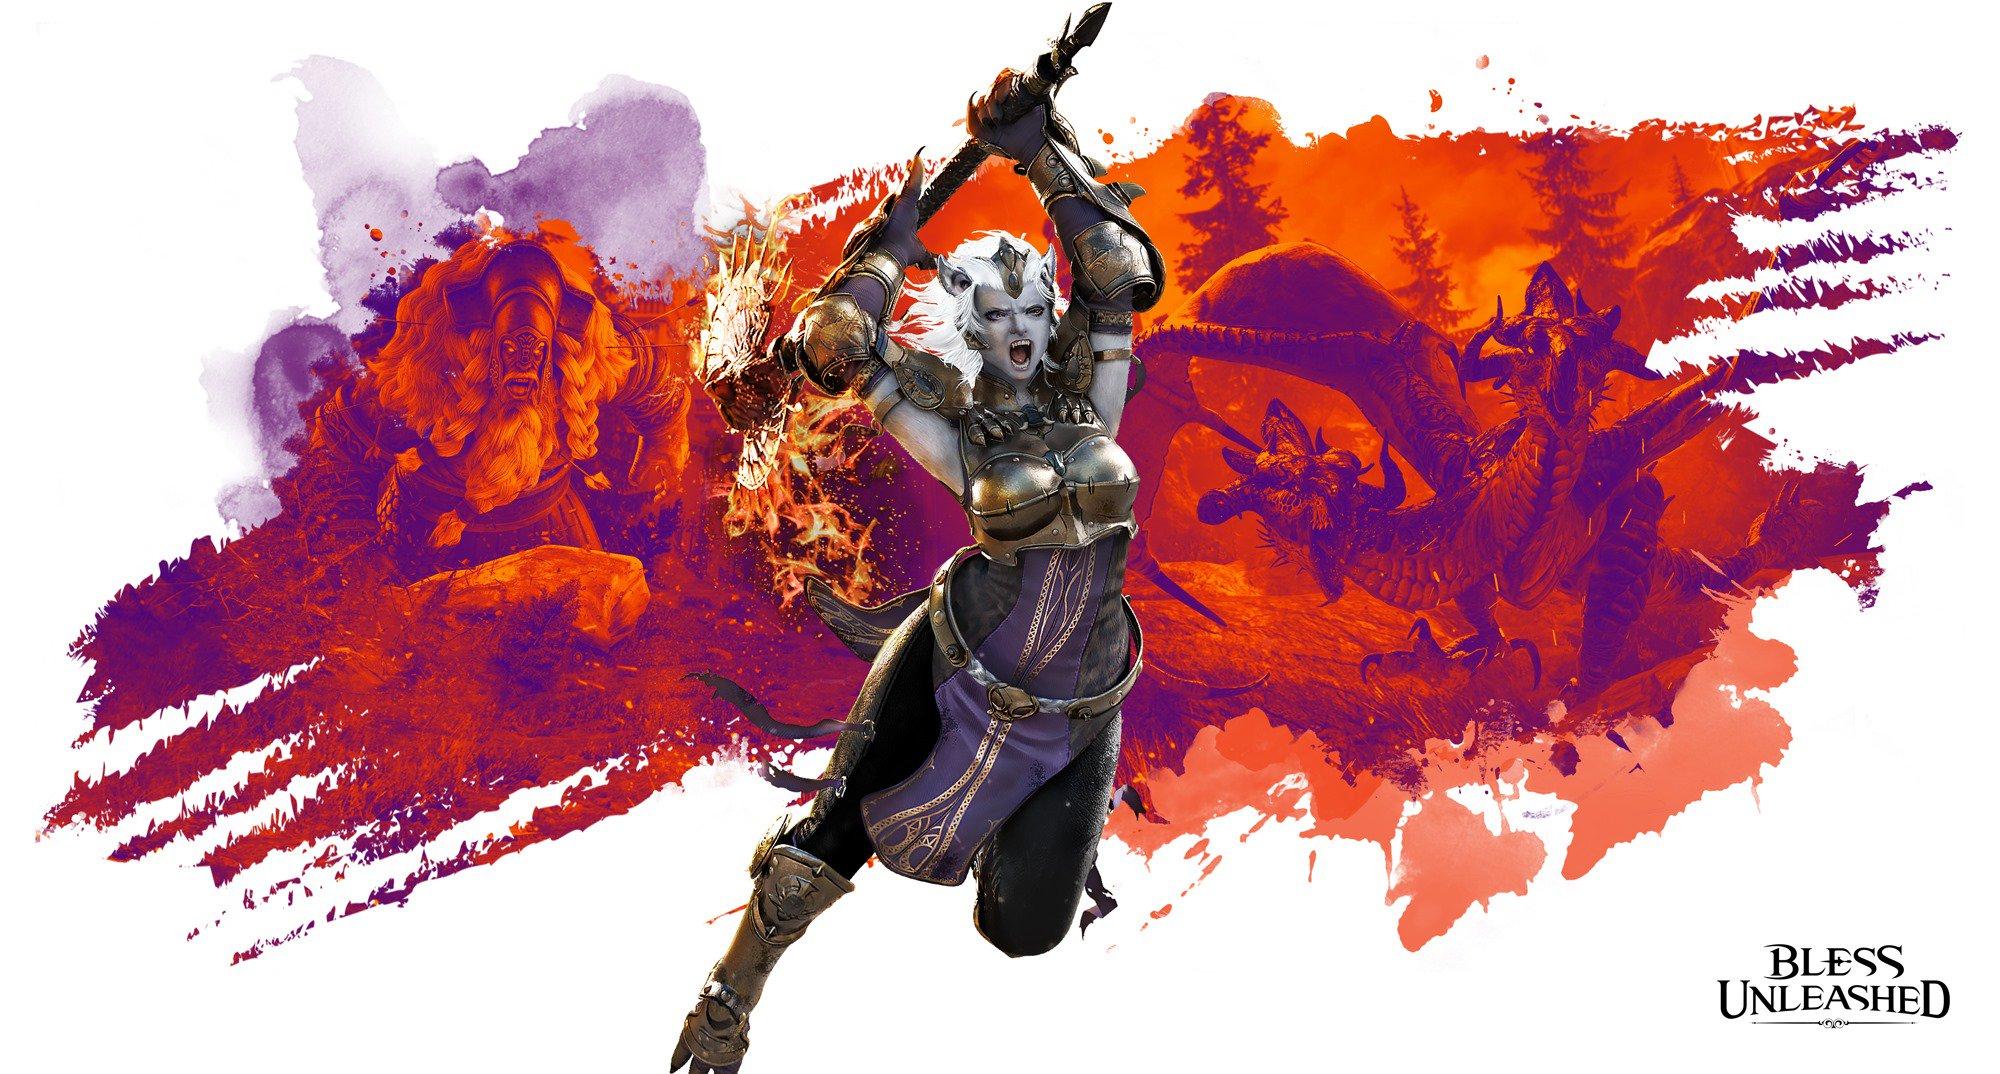 Bandai Namco anuncia su nuevo MMORPG para Xbox One: Bless Unleashed